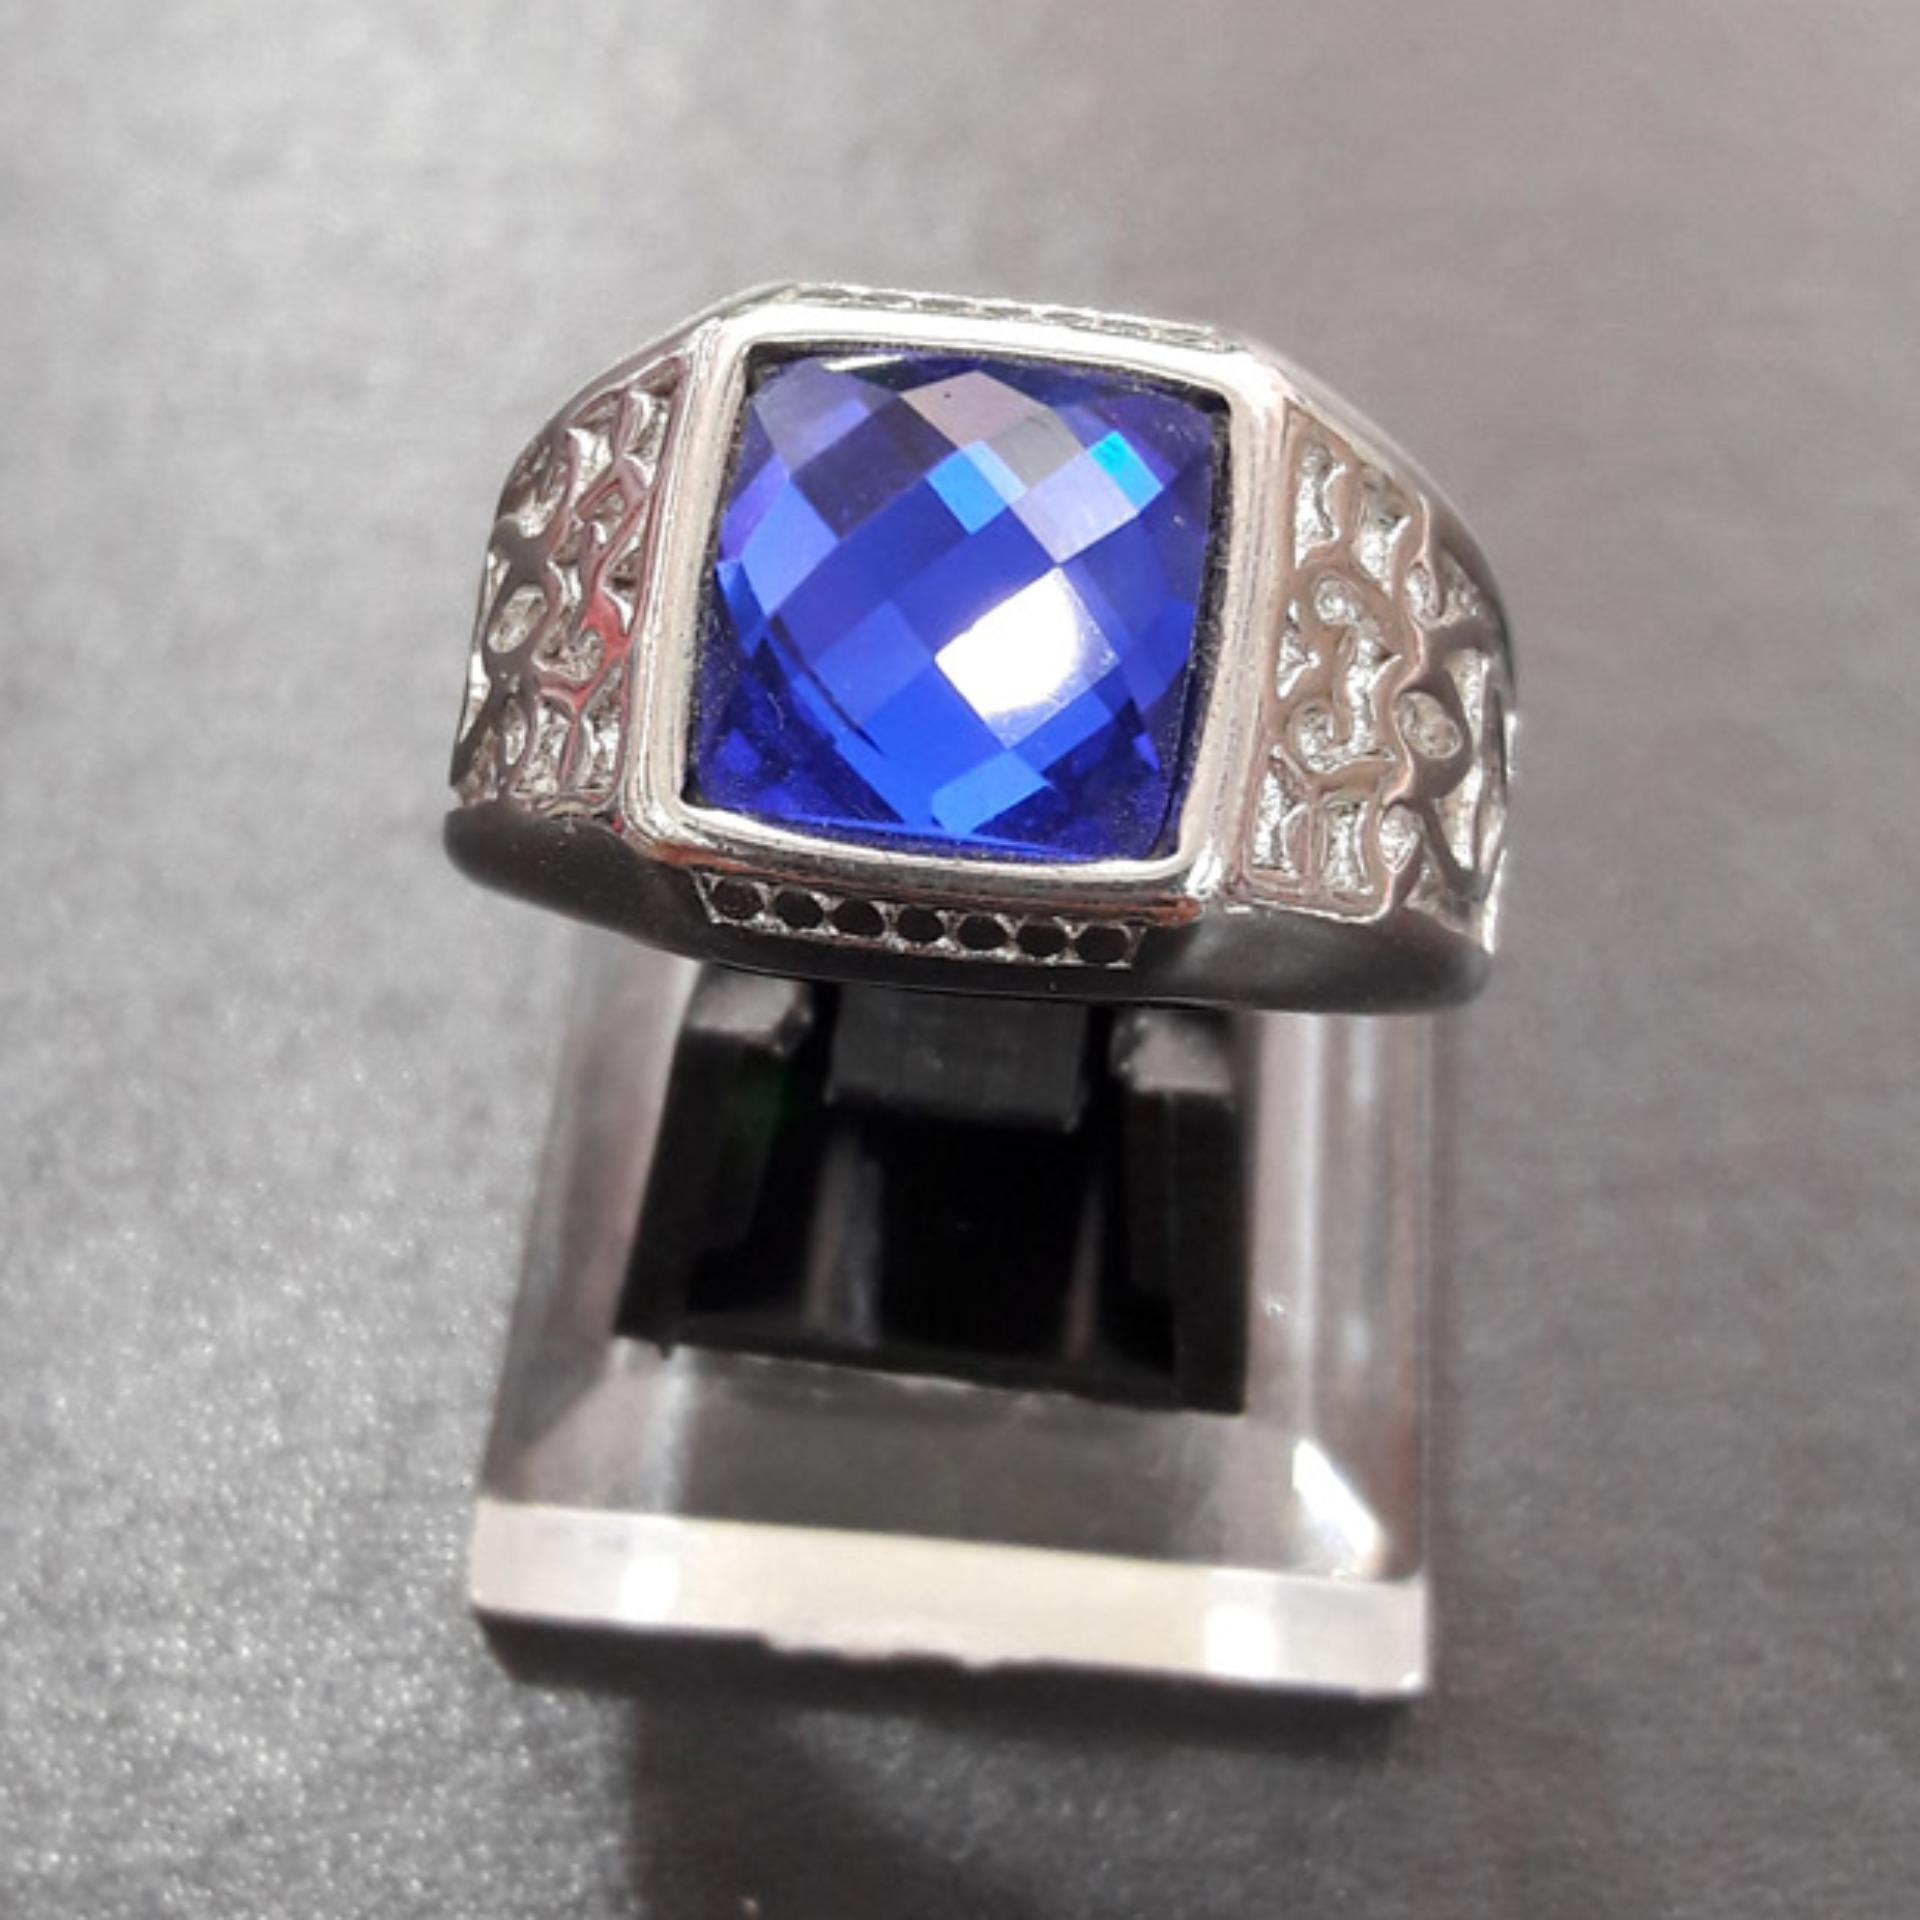 Beli Handmade Nandhut Cincin Batu Akik Mata Biru Cicil